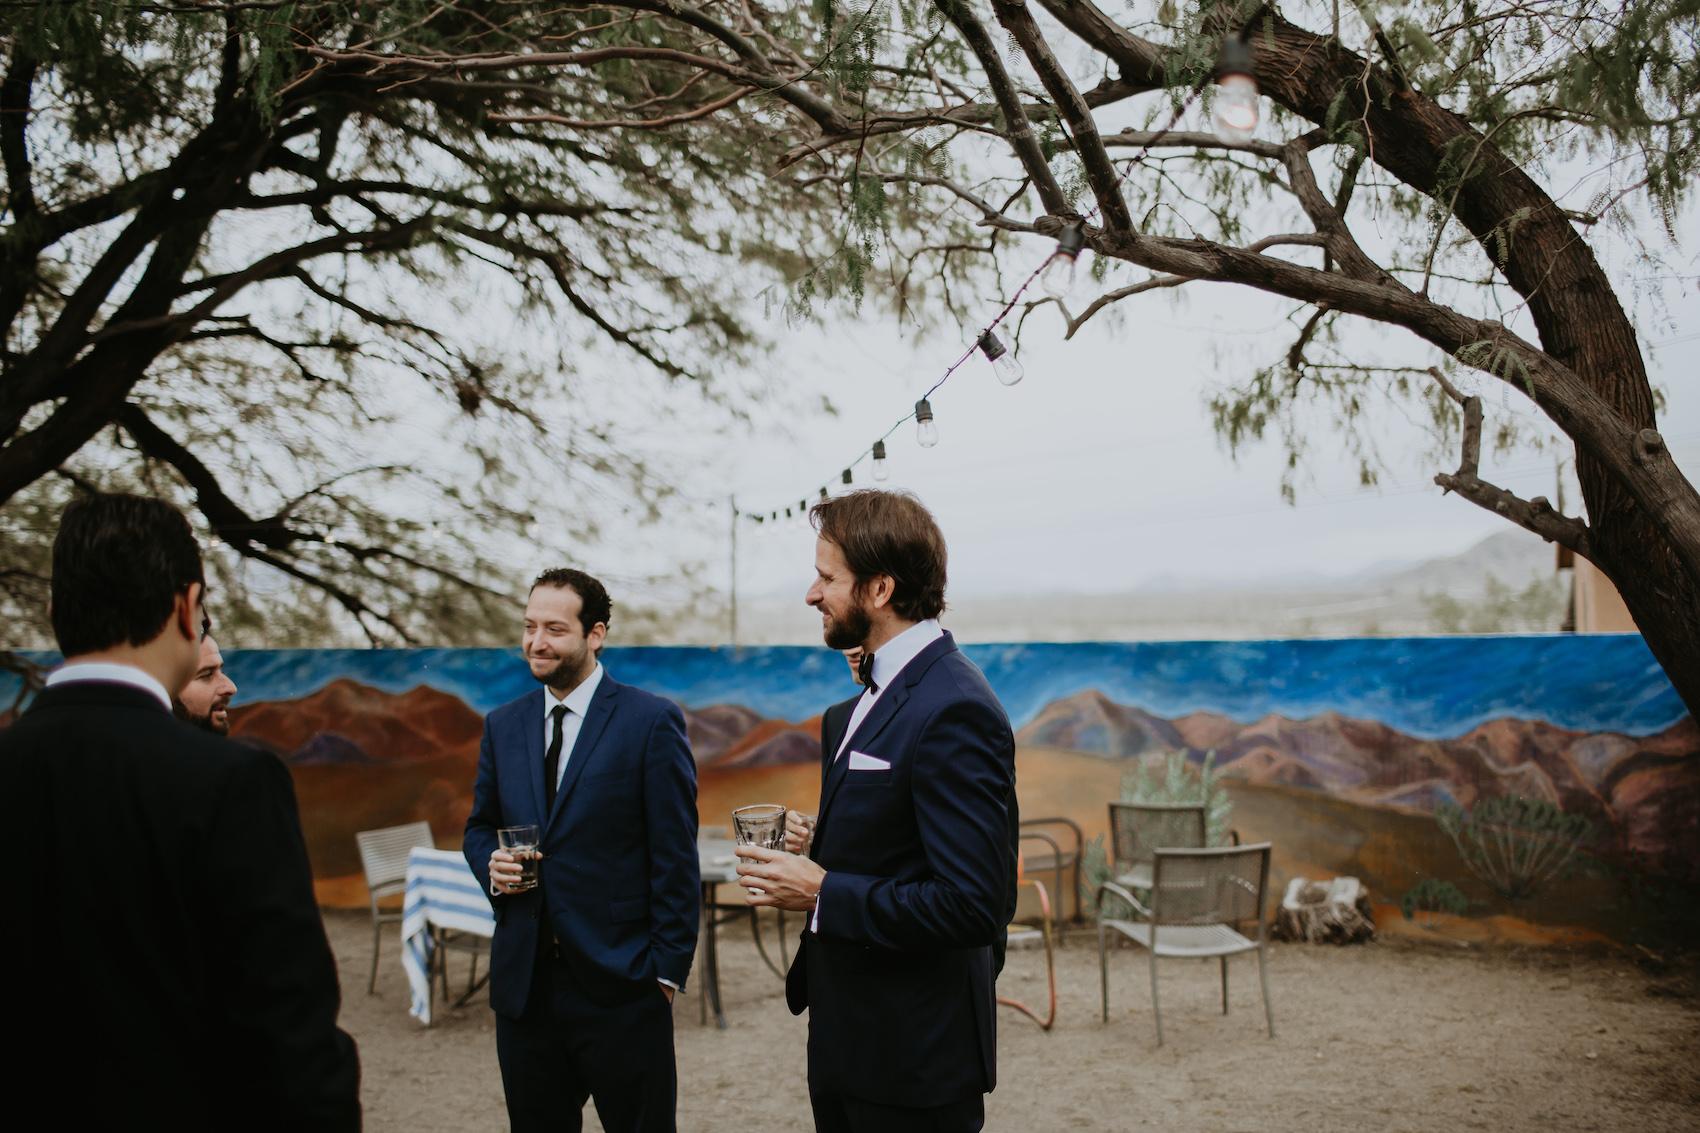 29-Palms-Inn-Joshua-Tree-Jewish-Wedding-H+M-7.jpg